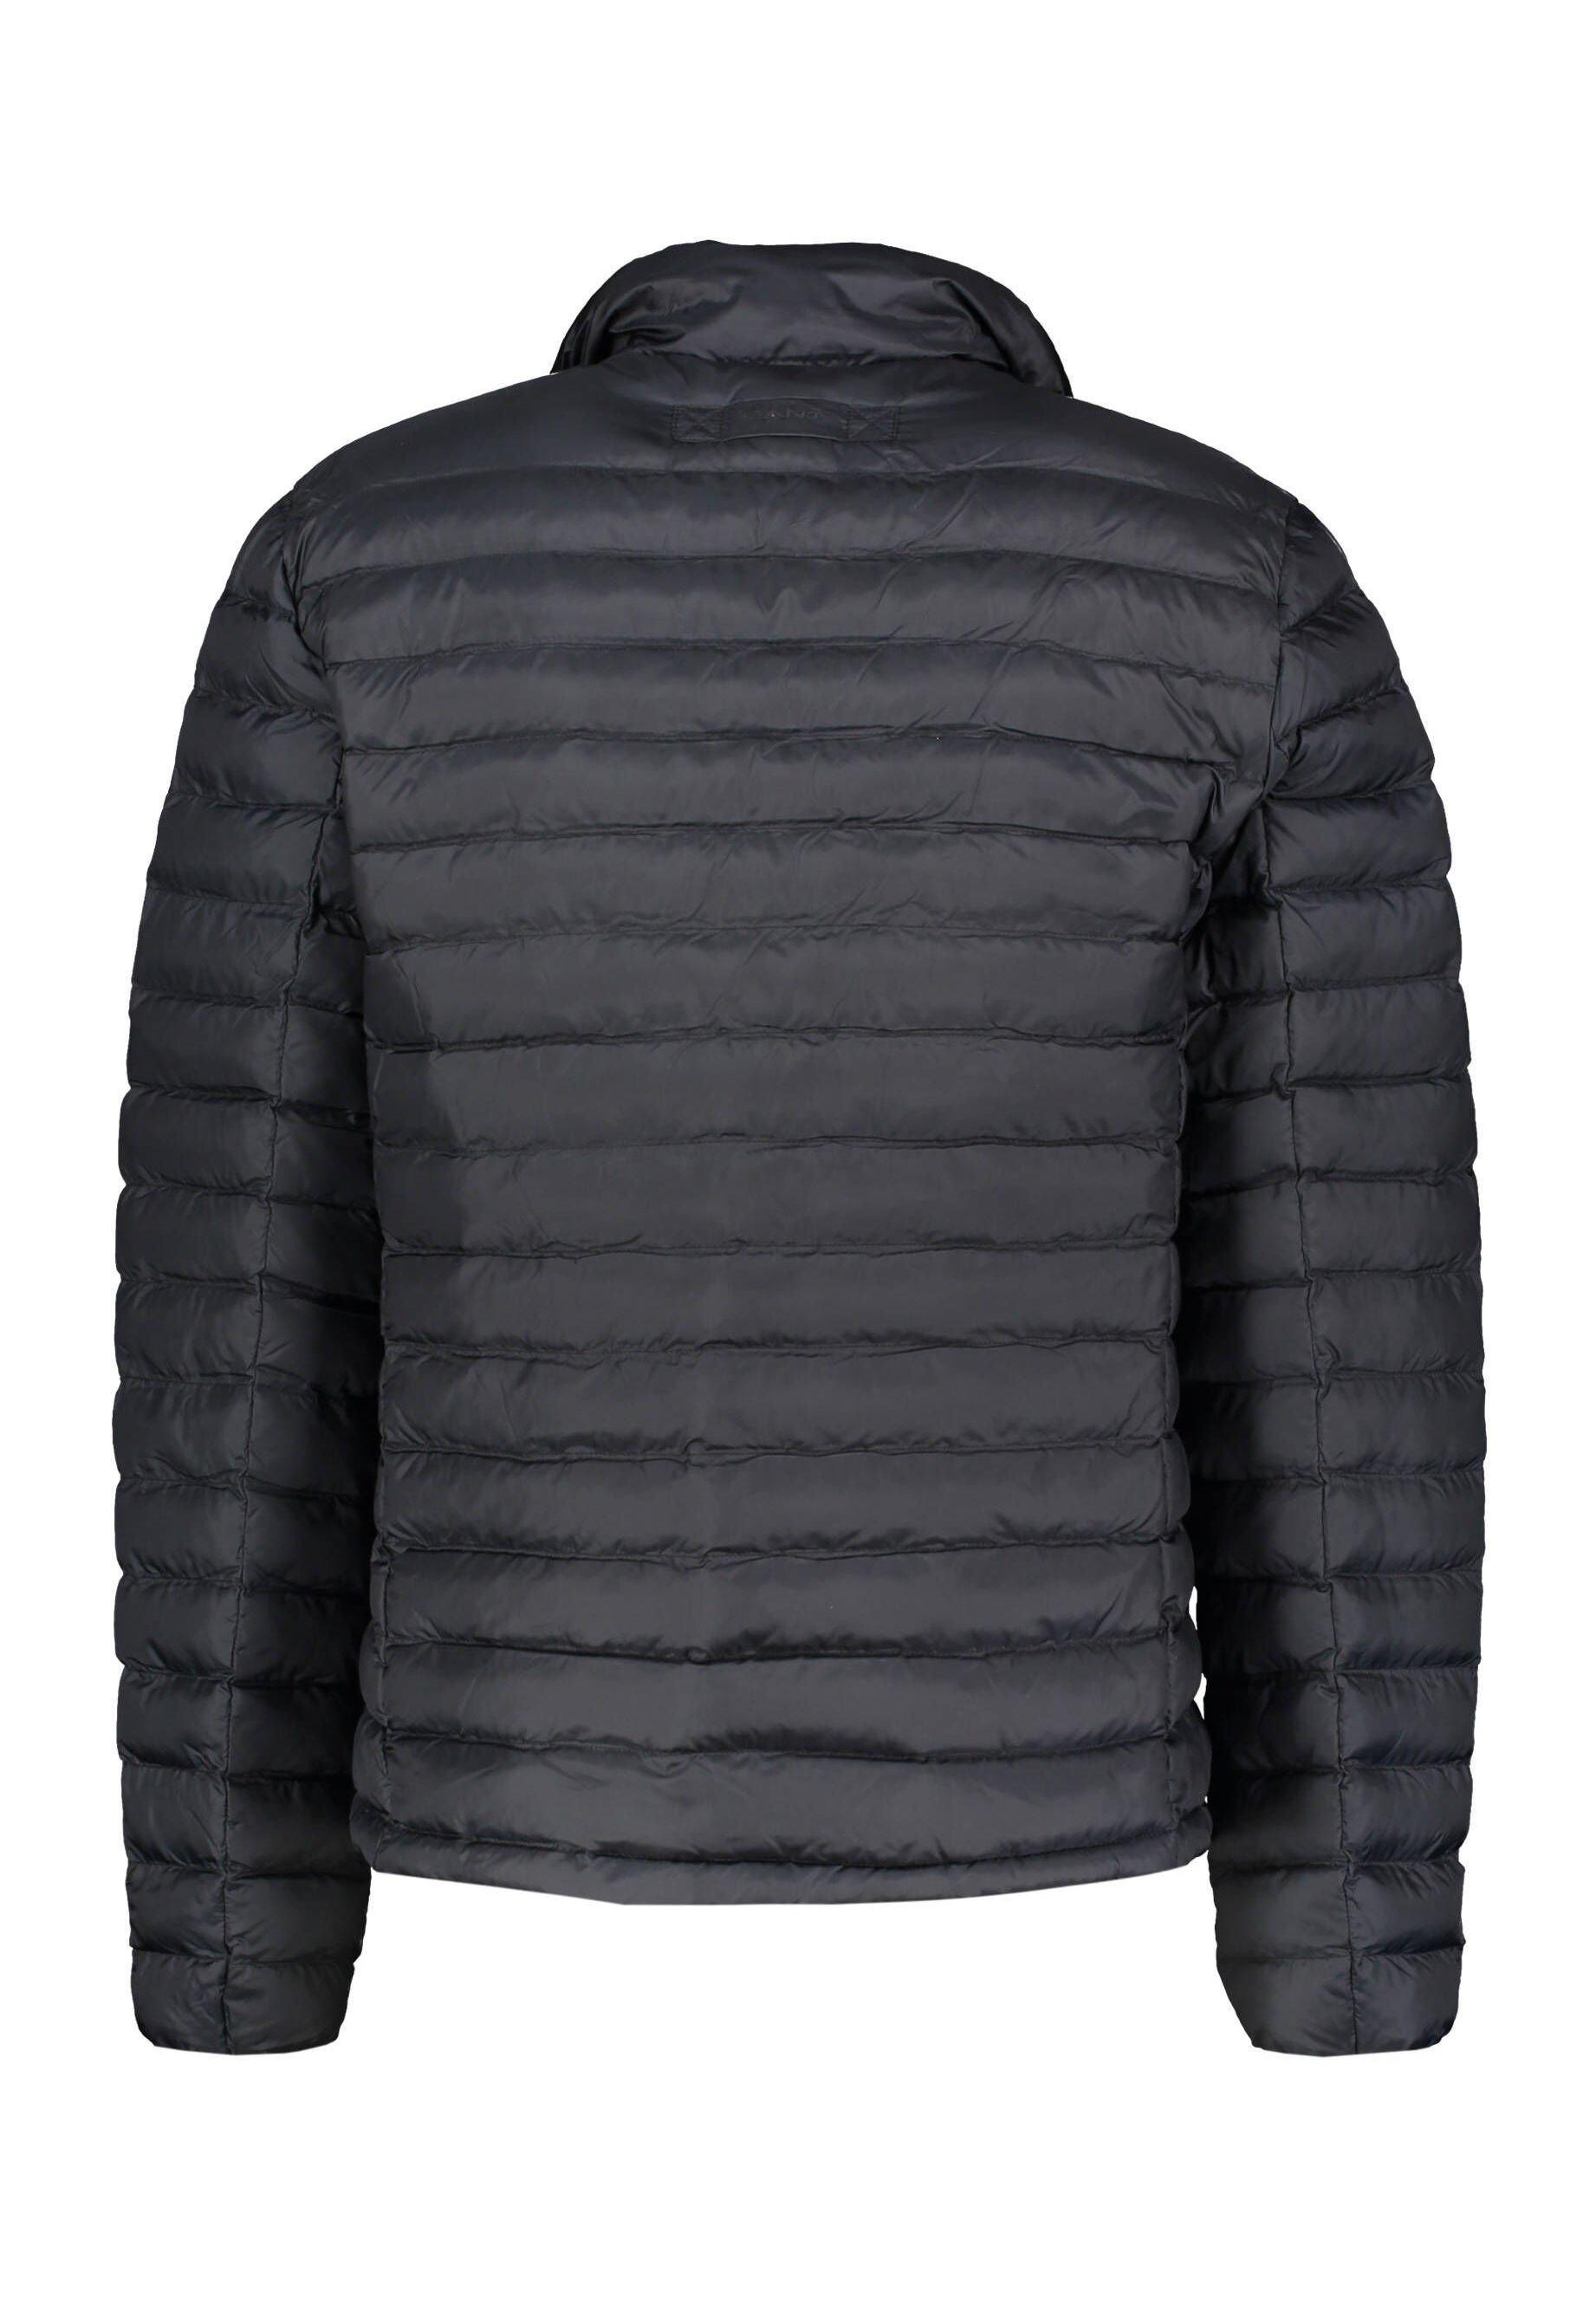 Homme Veste d'hiver - schwarz